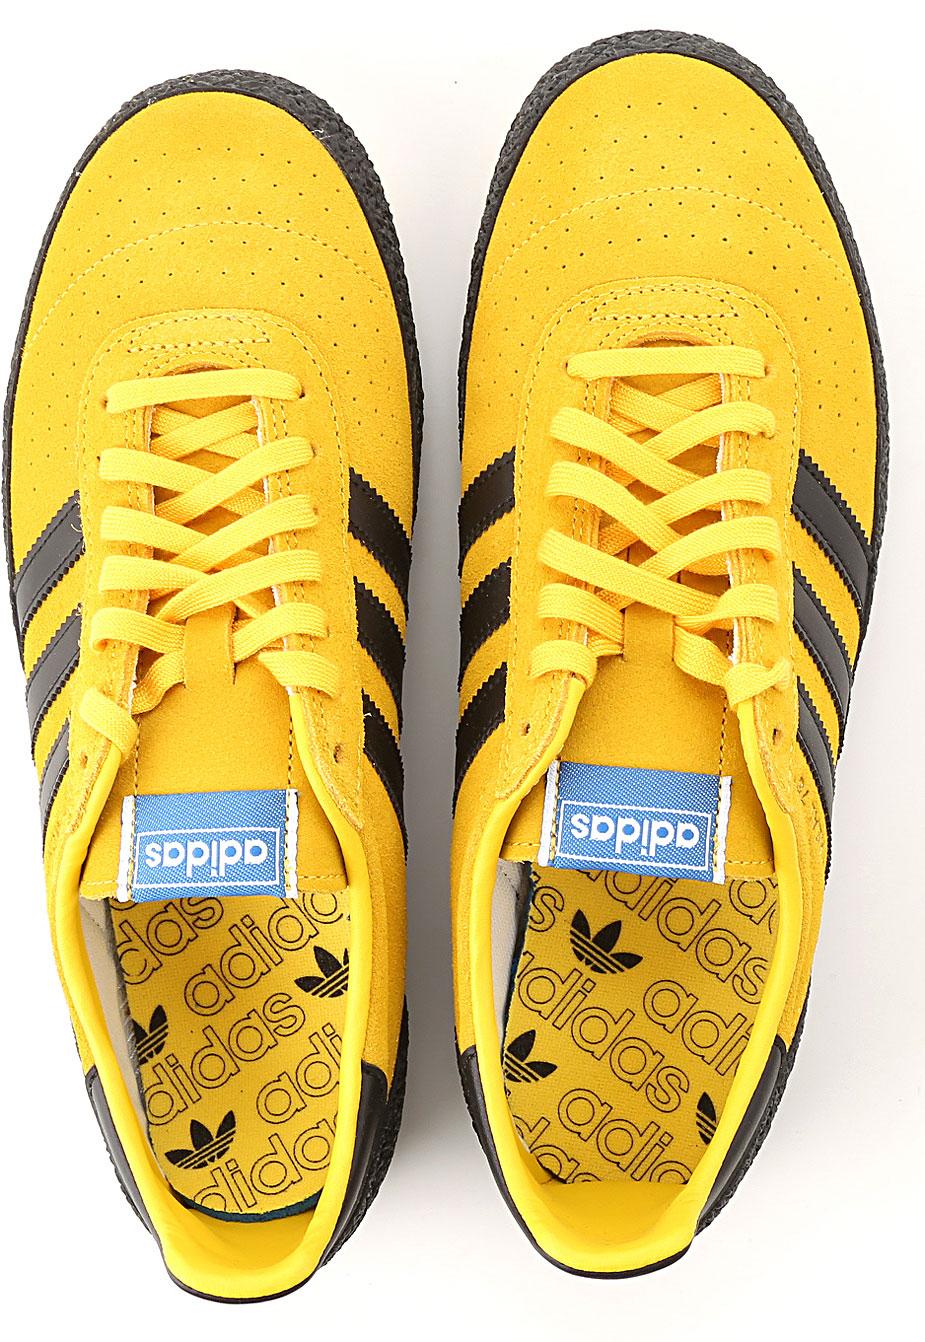 Adidas Chaussures Produit Vvz4iq Bd7635 Code Homme wkiTPOZuX